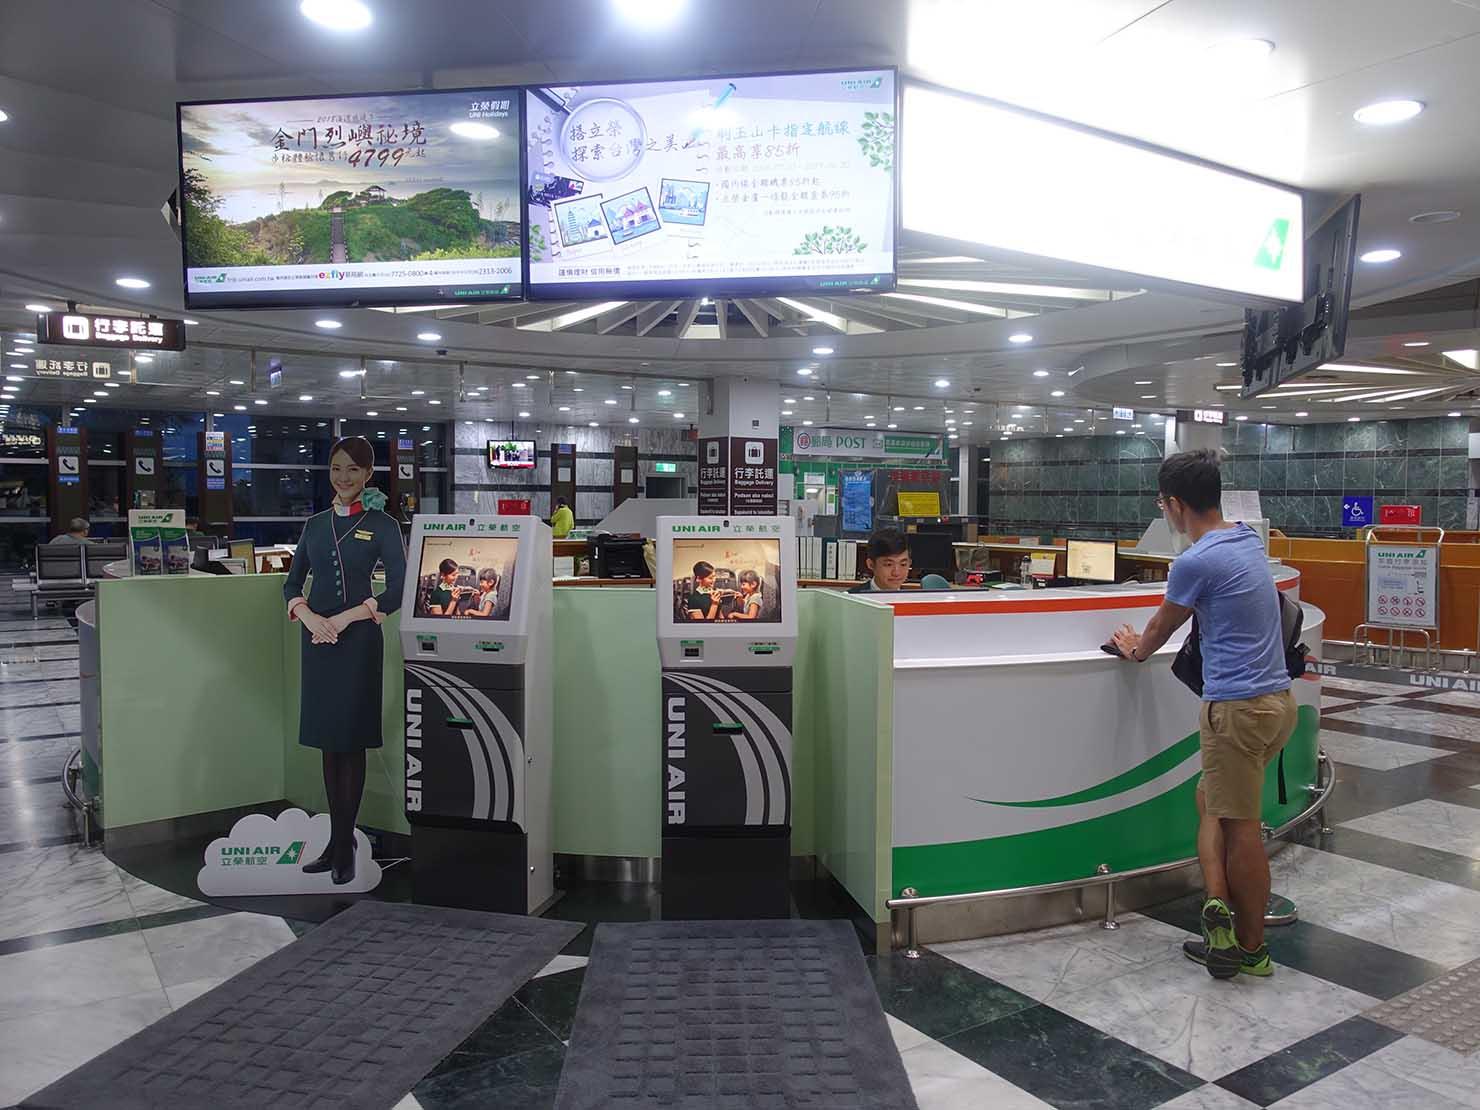 KKday外国人限定「花蓮・太魯閣(タロコ)日帰りツアー」花蓮空港にある立榮航空(UNI AIR)のチェックインカウンター